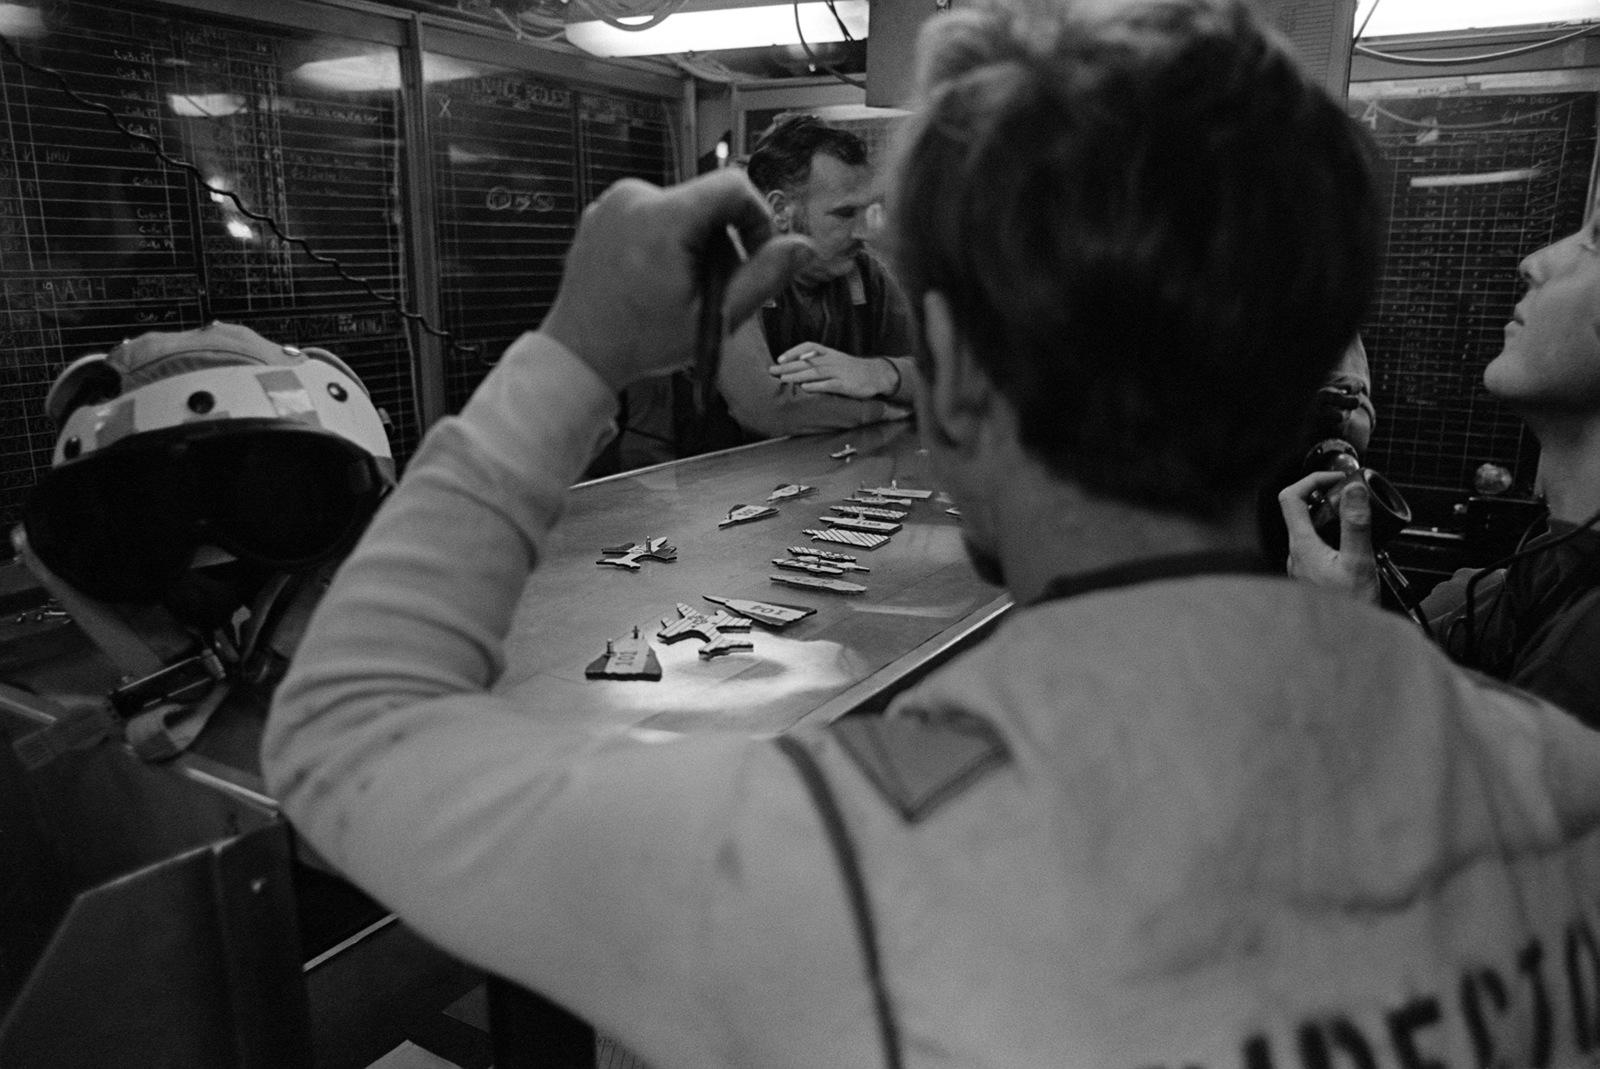 Crewmen inside the flight deck center aboard the aircraft carrier USS KITTY HAWK (CV 63) use a table to simulate the arrangement of aircraft on the carrier's flight deck